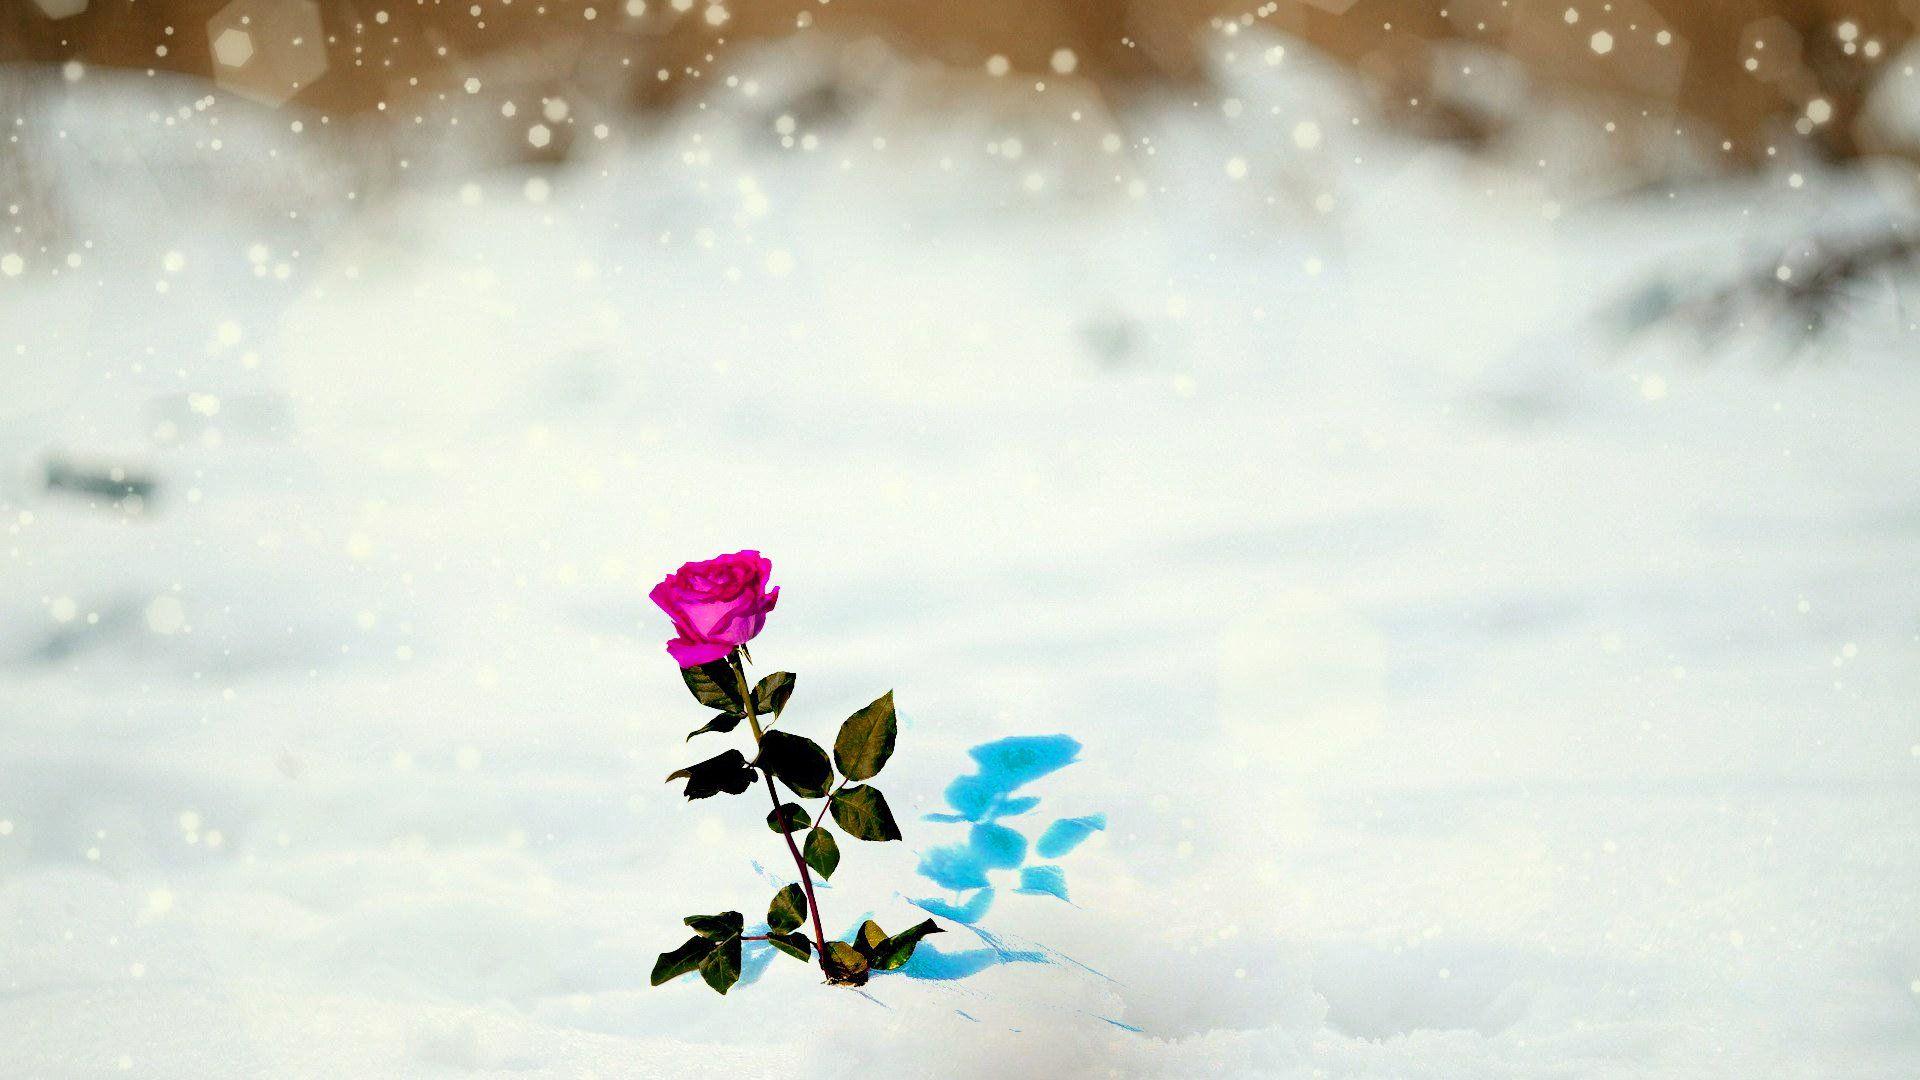 Под снегом бесплатно